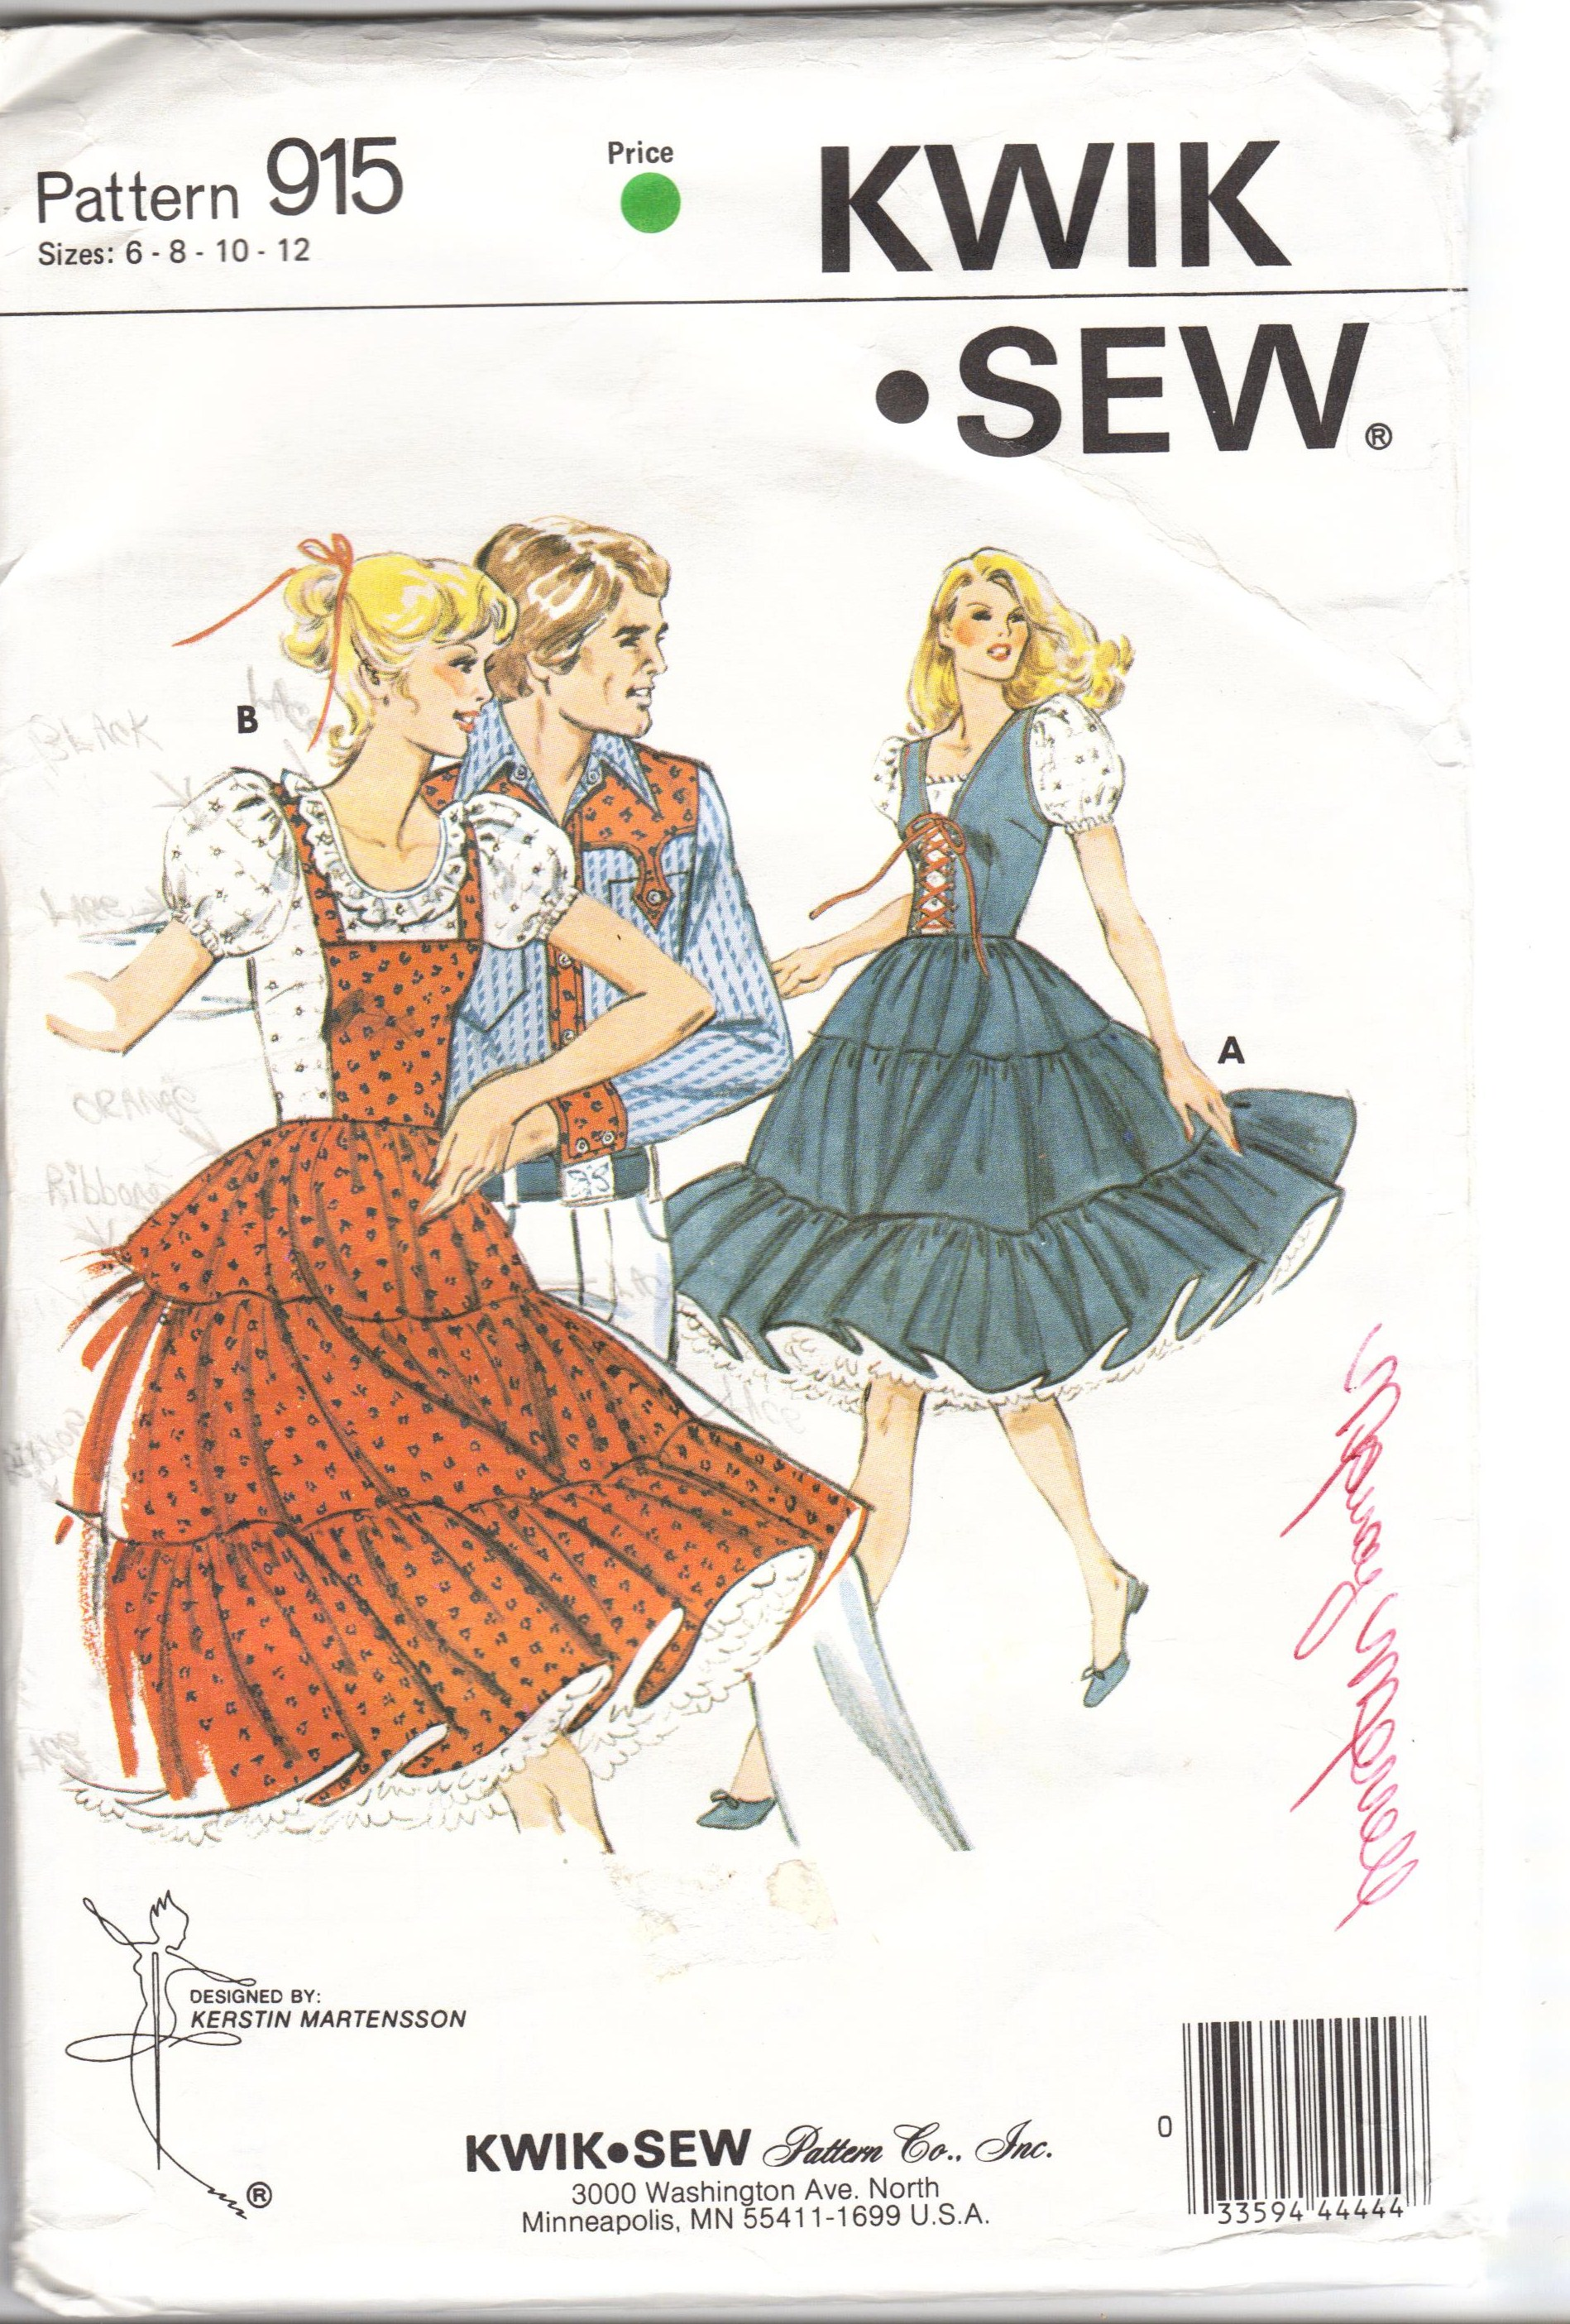 Kwik Sew 915